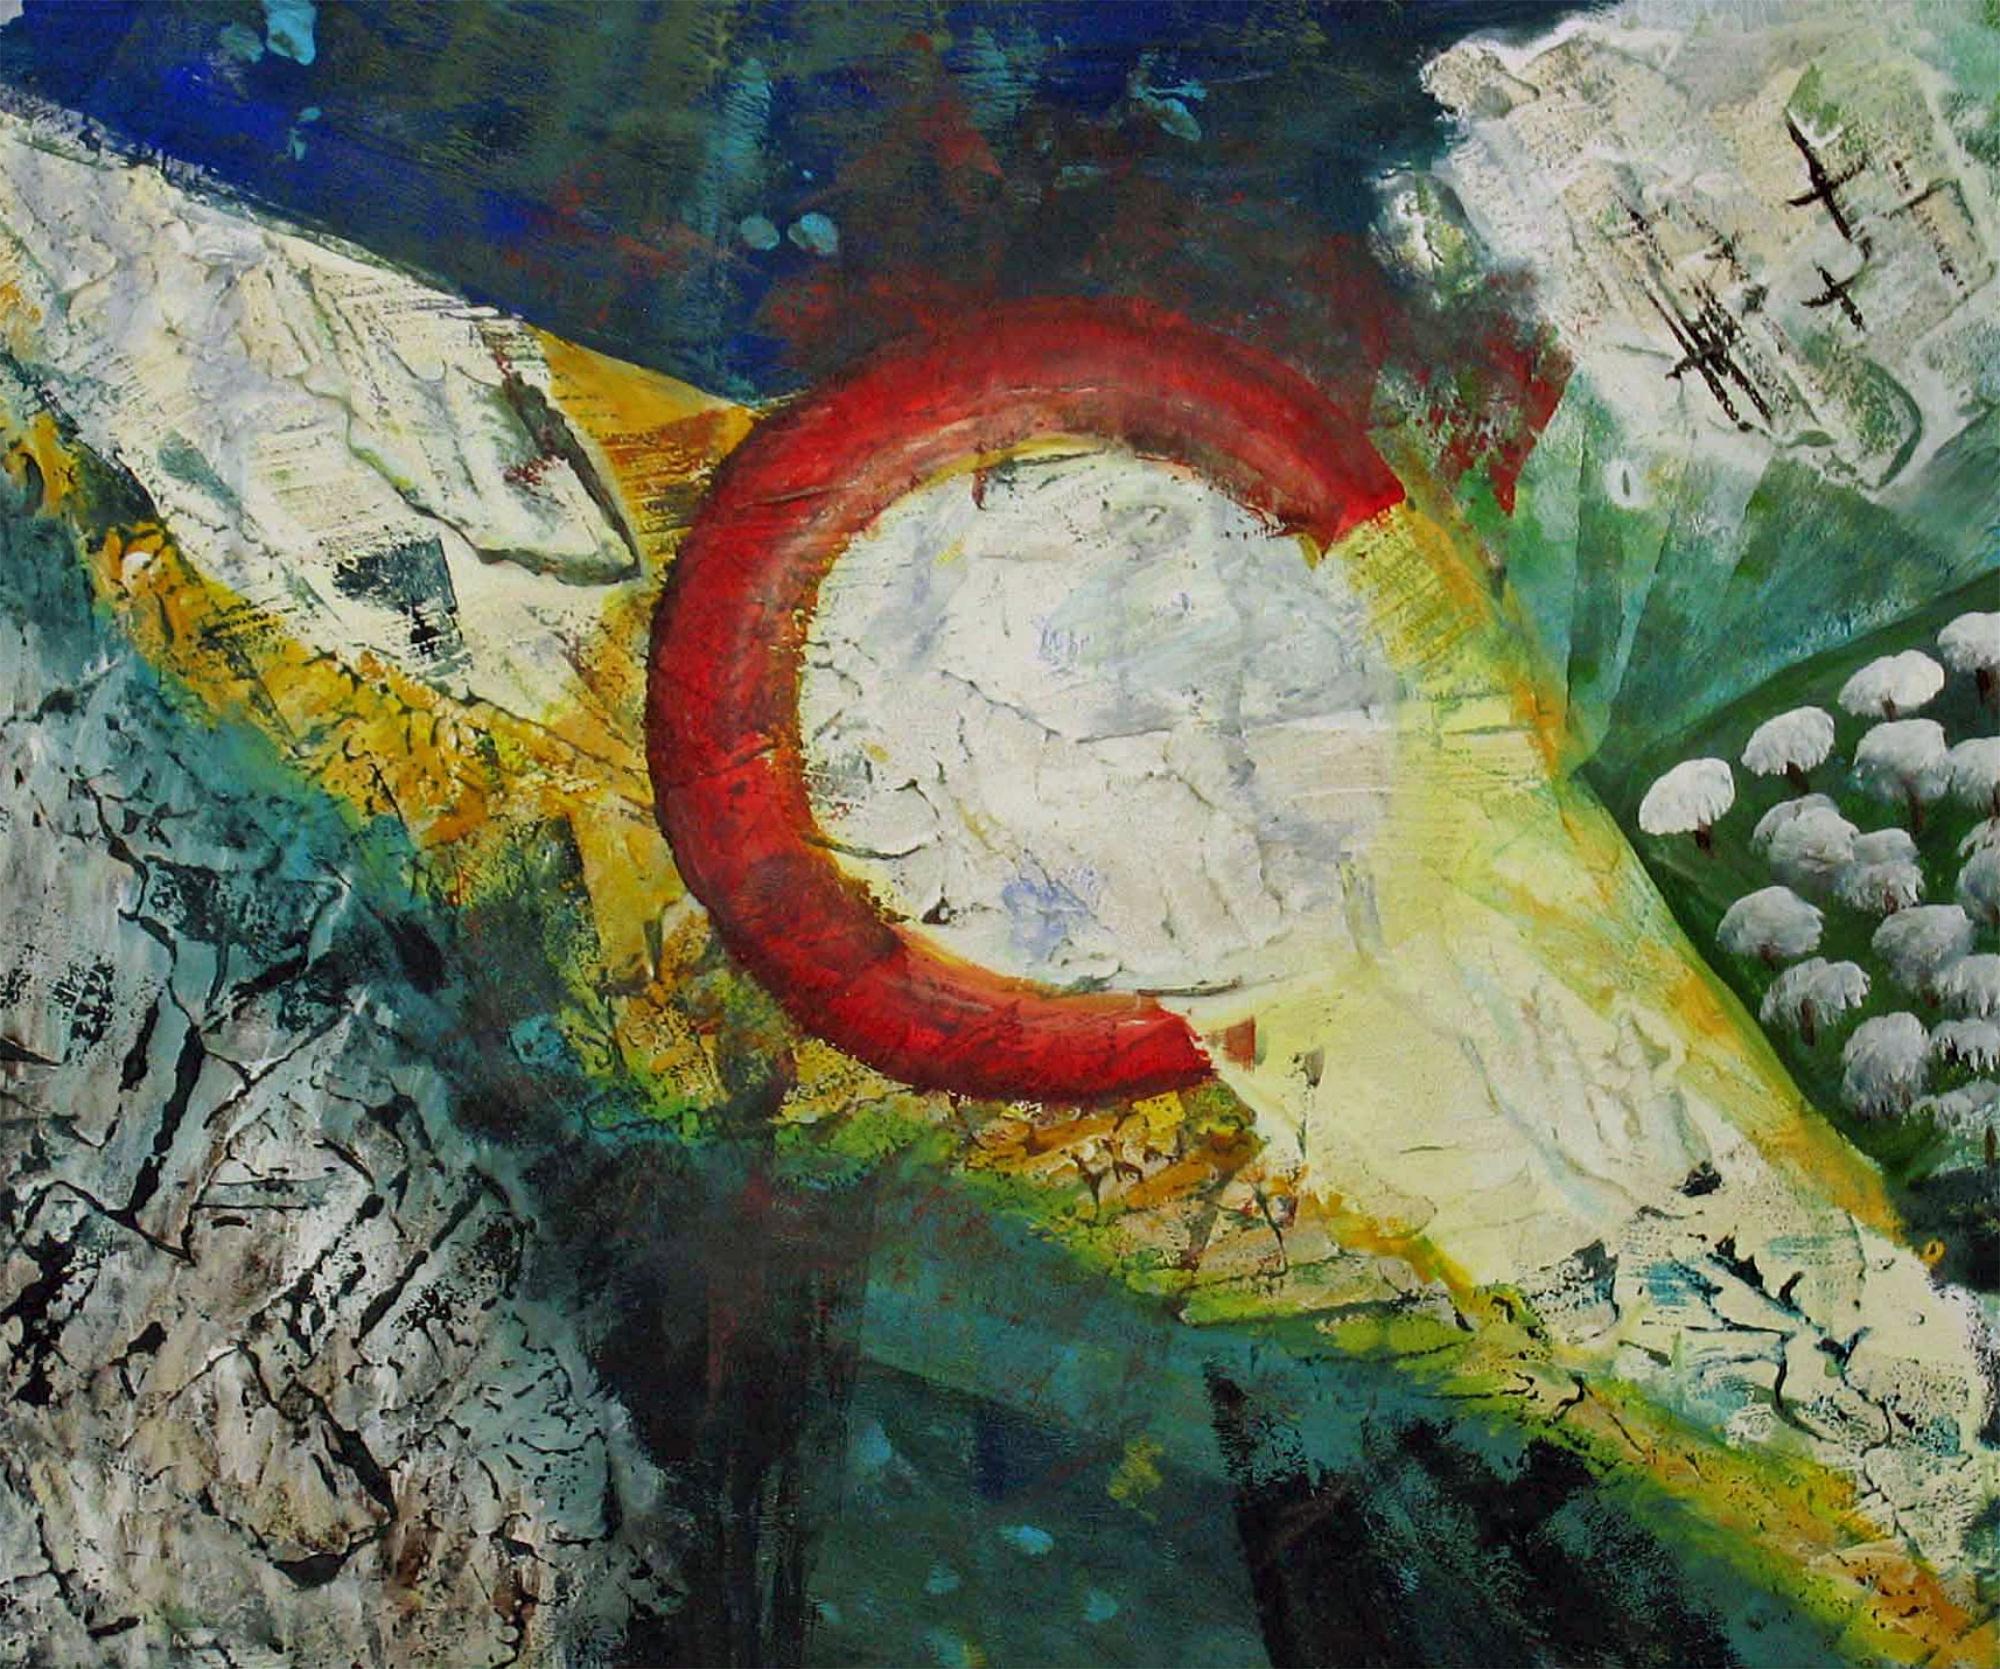 2008 - Auferstehung, 60x50cm, Acryl-Spachteln